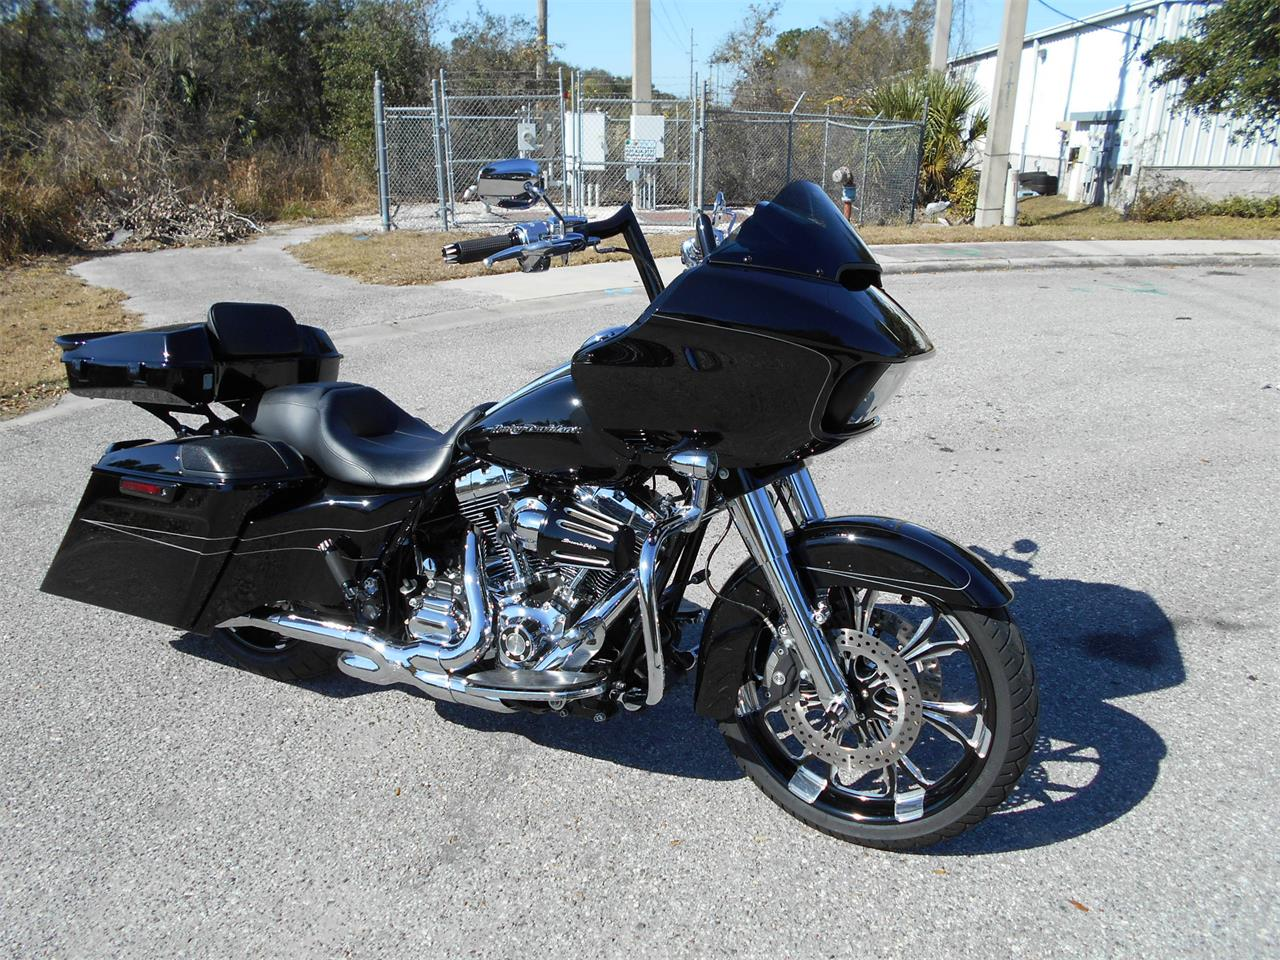 2015 Harley Davidson Road Glide For Sale Classiccars Com Cc 1059184